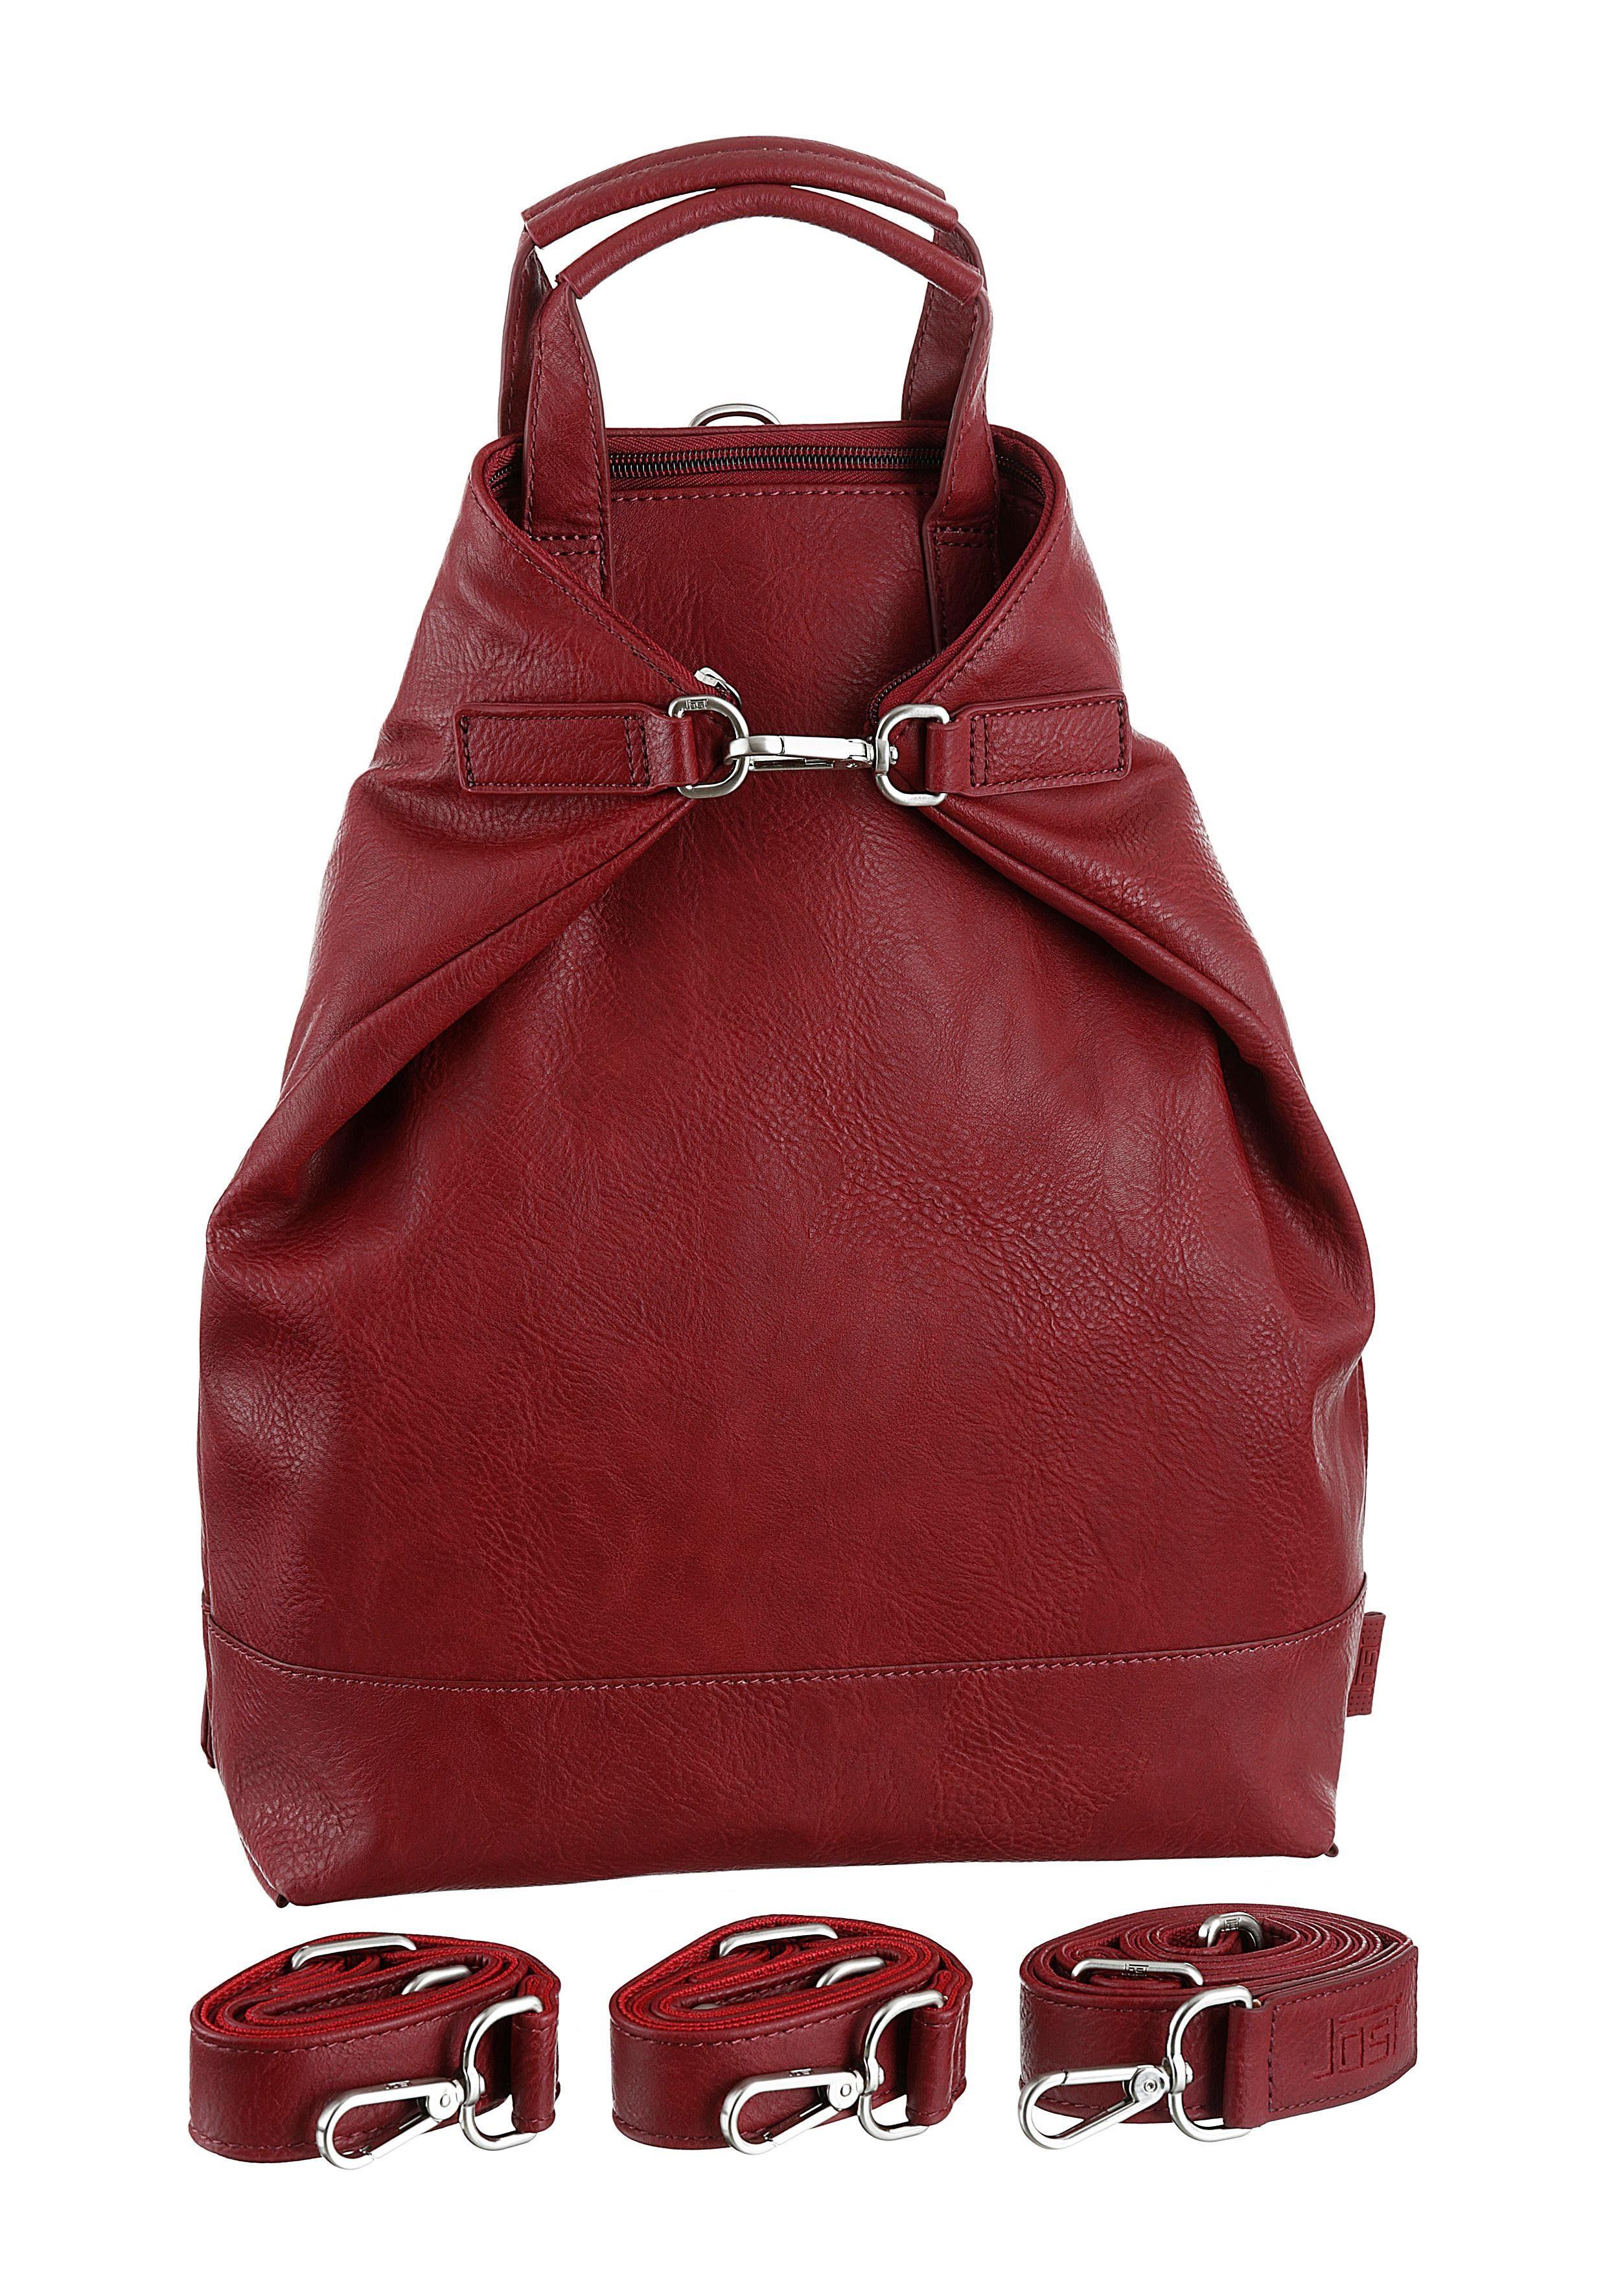 Jost Henkeltasche »Merritt«, 3-in1 Bag auch als Rucksack tragbar